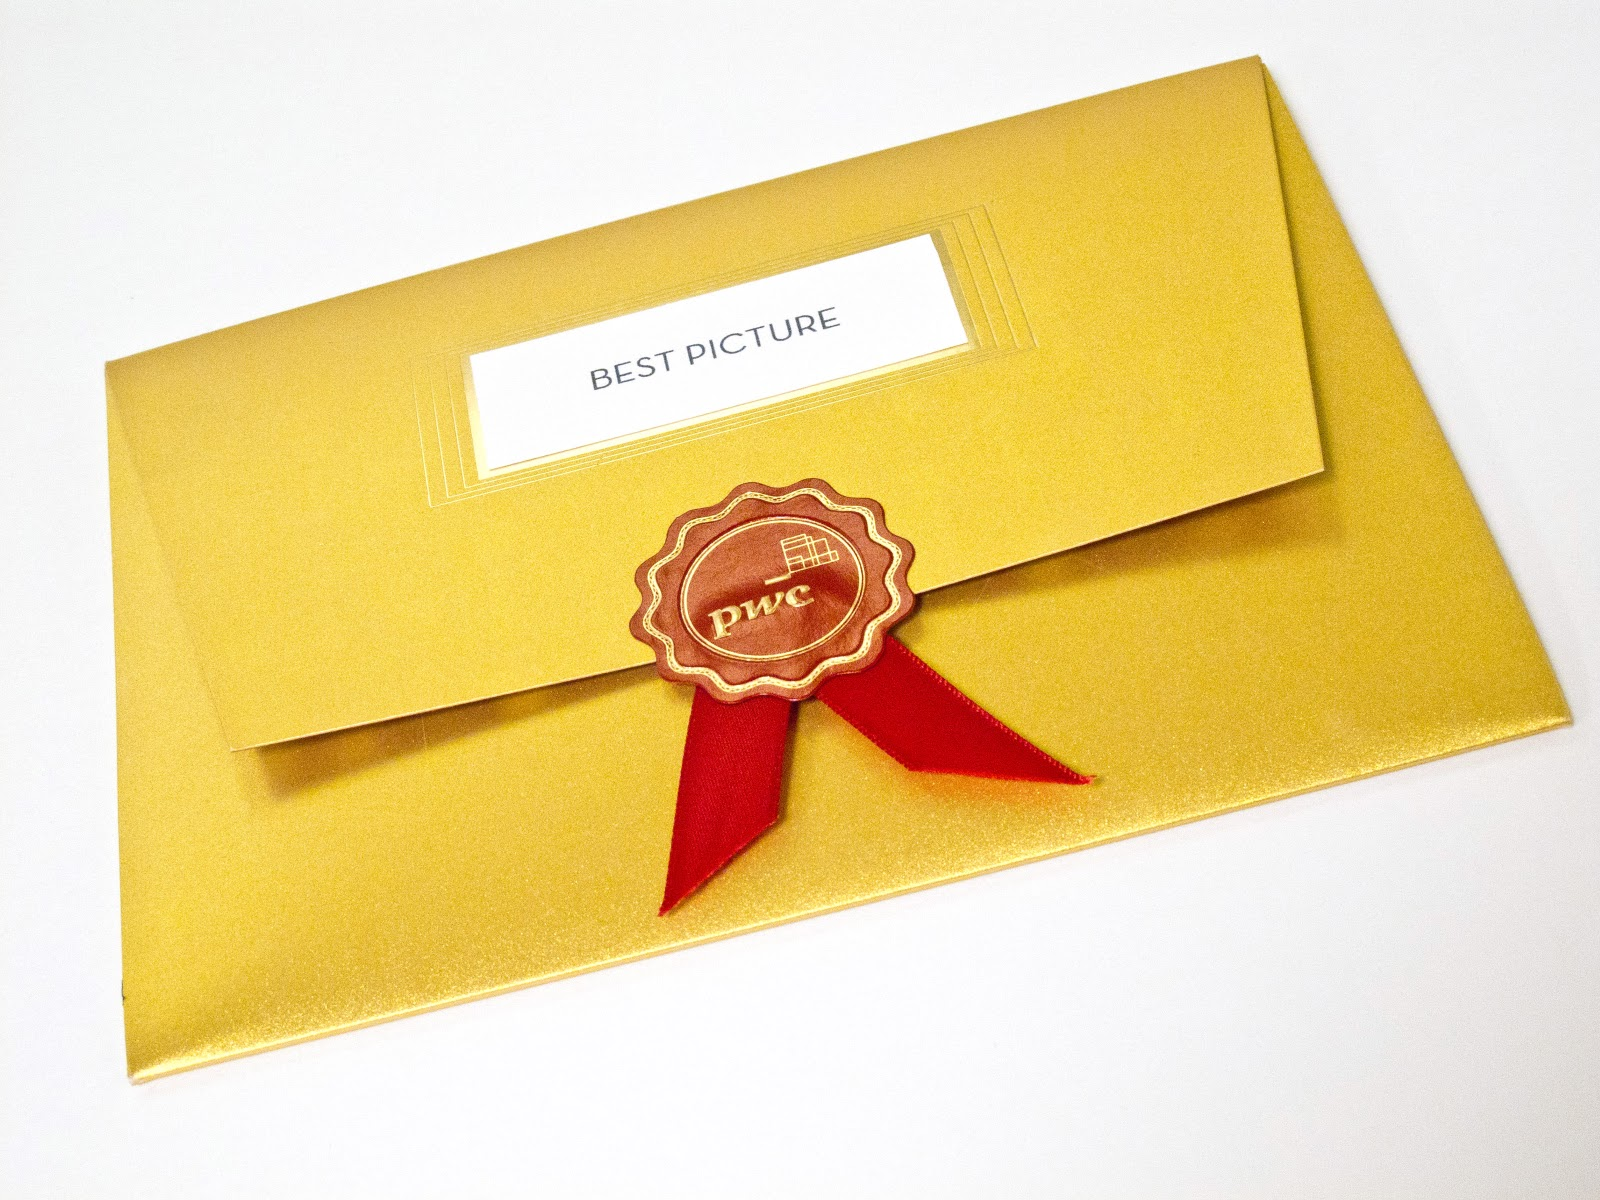 oscar Academy awards envelope clipart jpg.